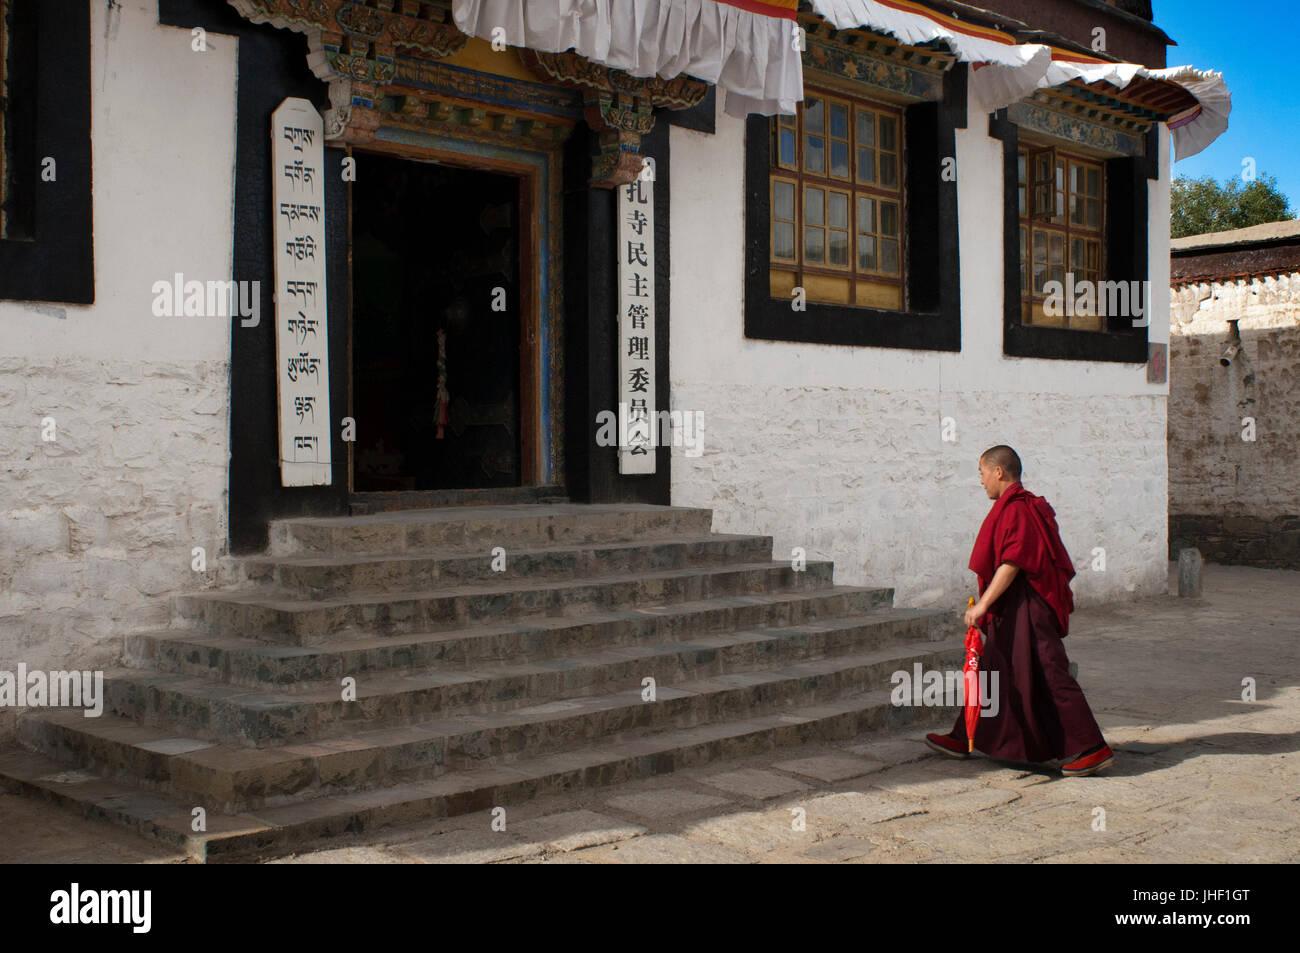 Monk inside Tashilumpo Monastery at Shigatse, Tibet, China. - Stock Image